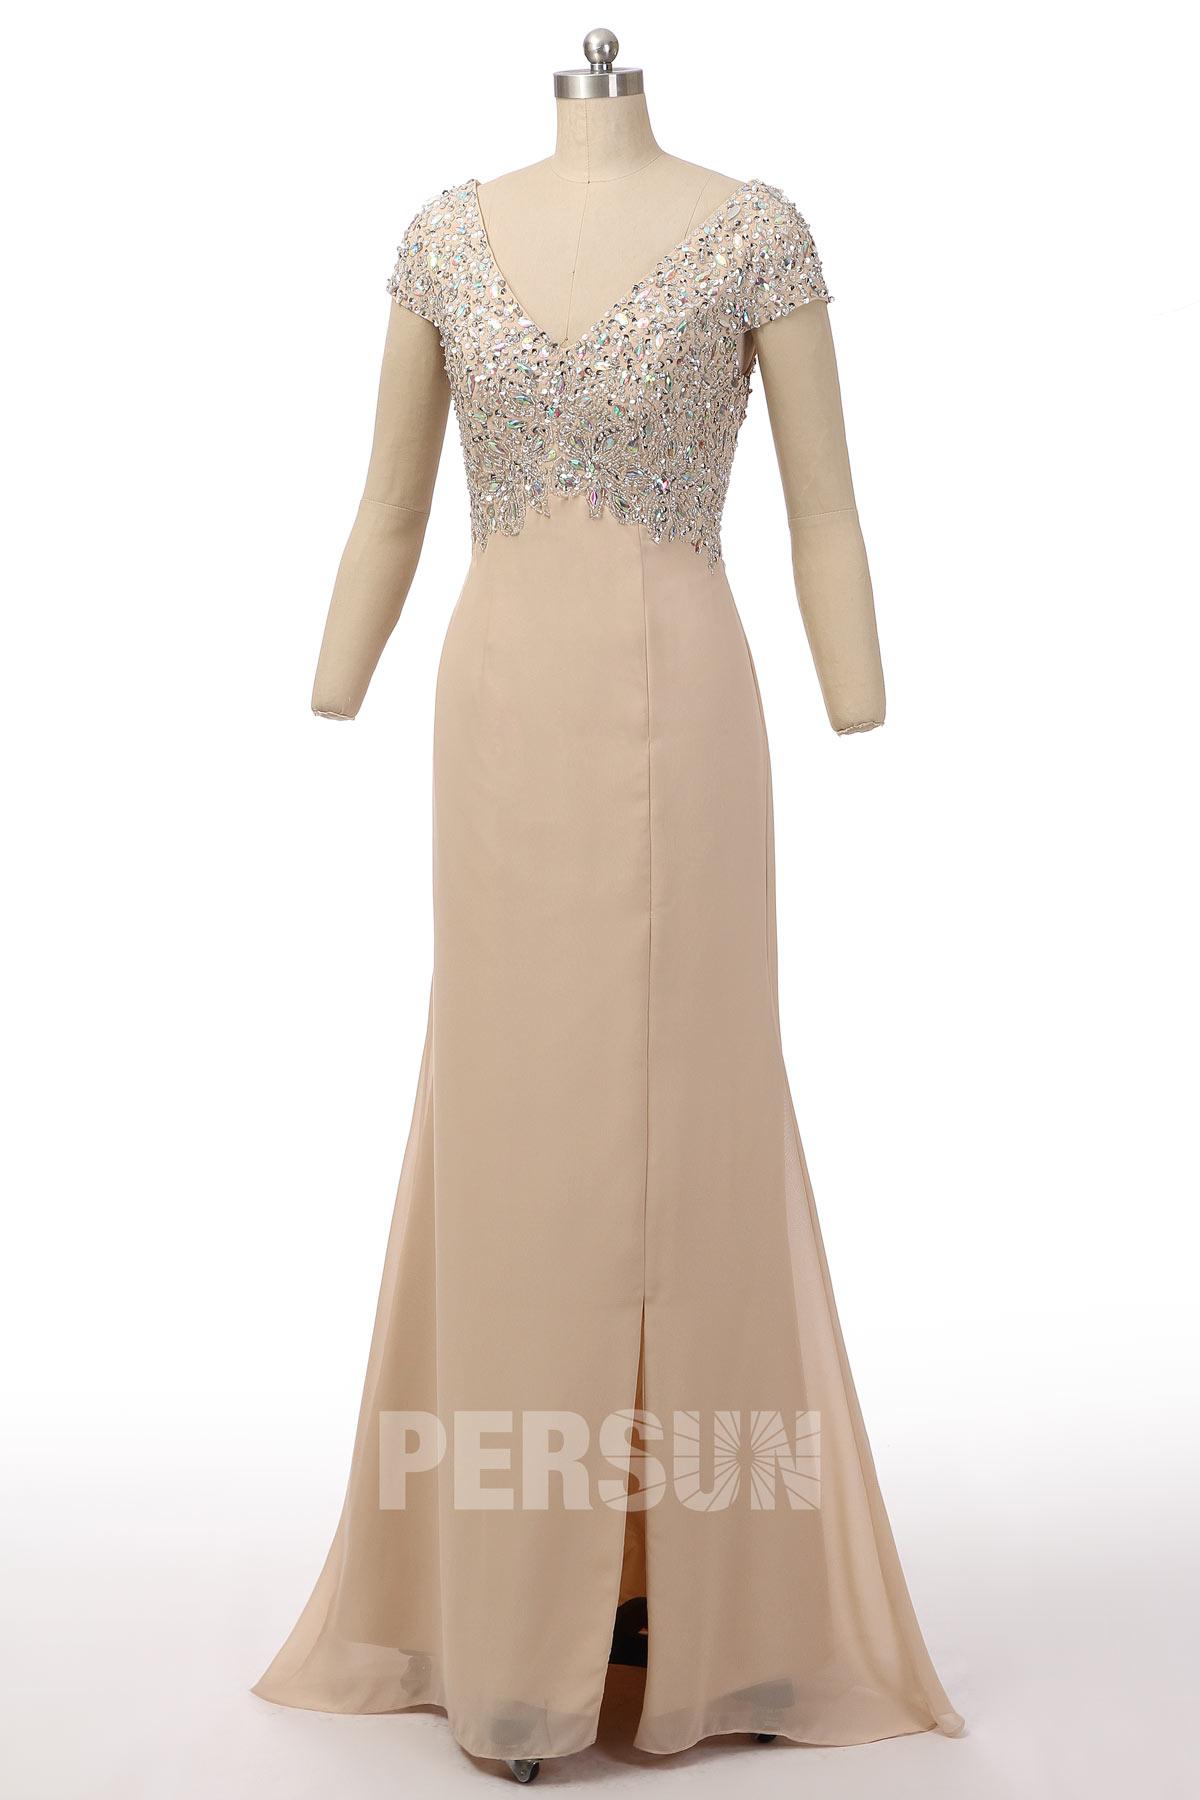 robe mère mariée champagne fendue longue col v ornée de strass